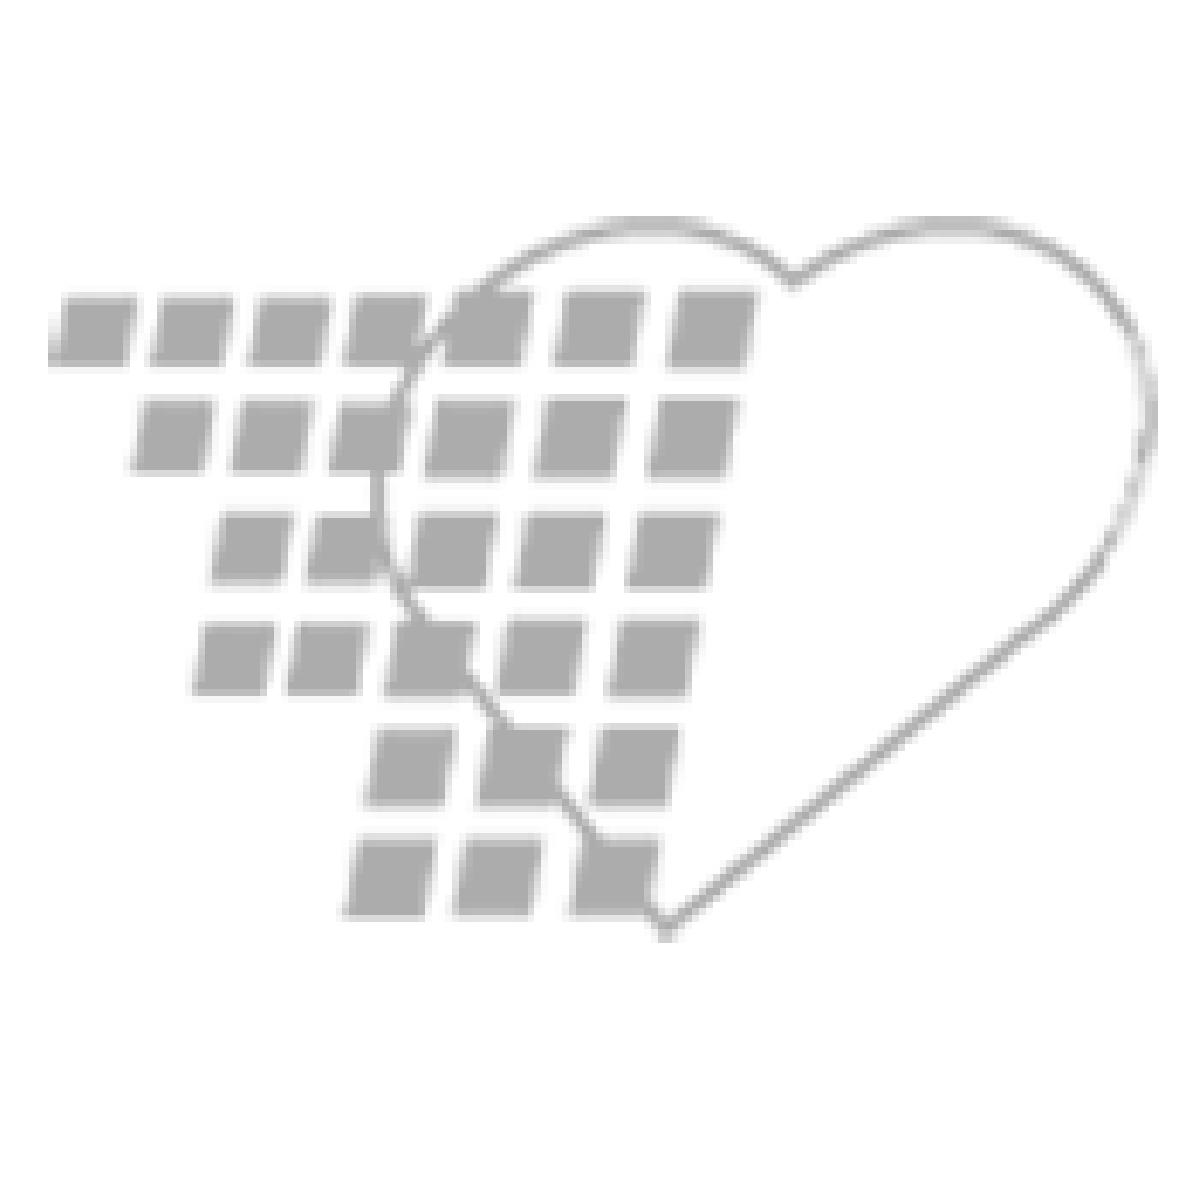 06-82-2050 Carpuject® Cartridge Unit